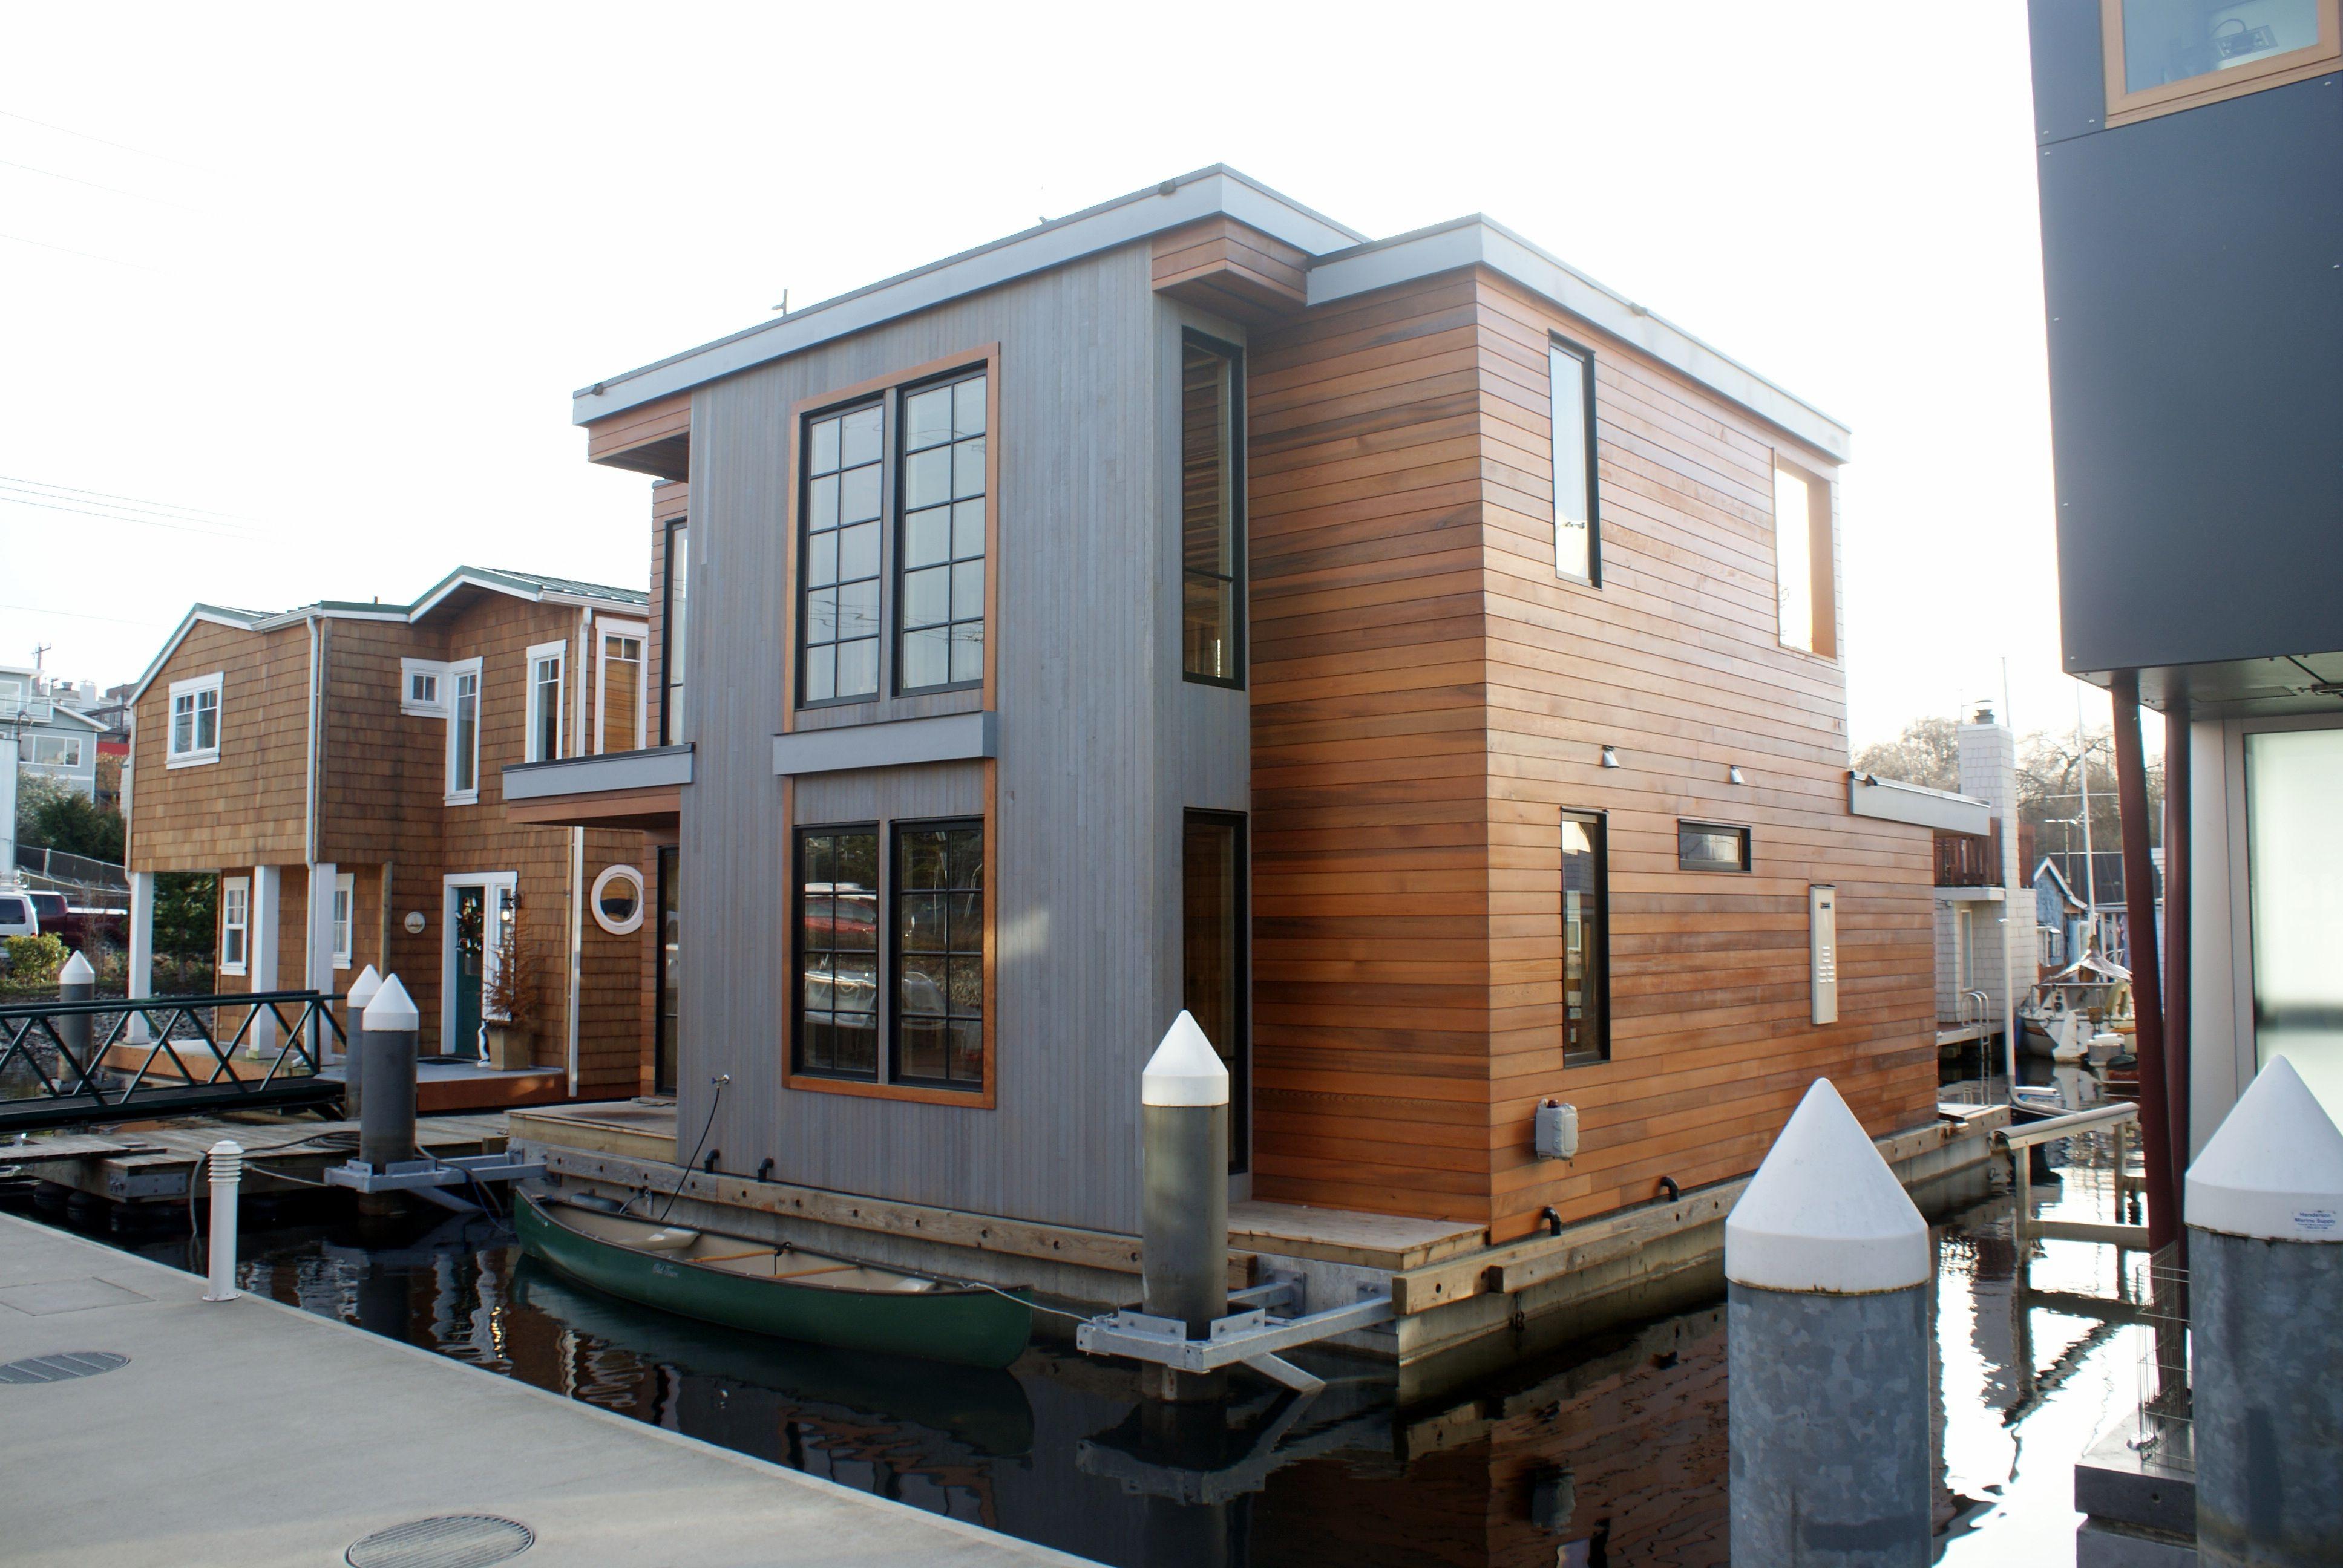 Float home lake union seattle floating houses pinterest - Floating house seattle ...